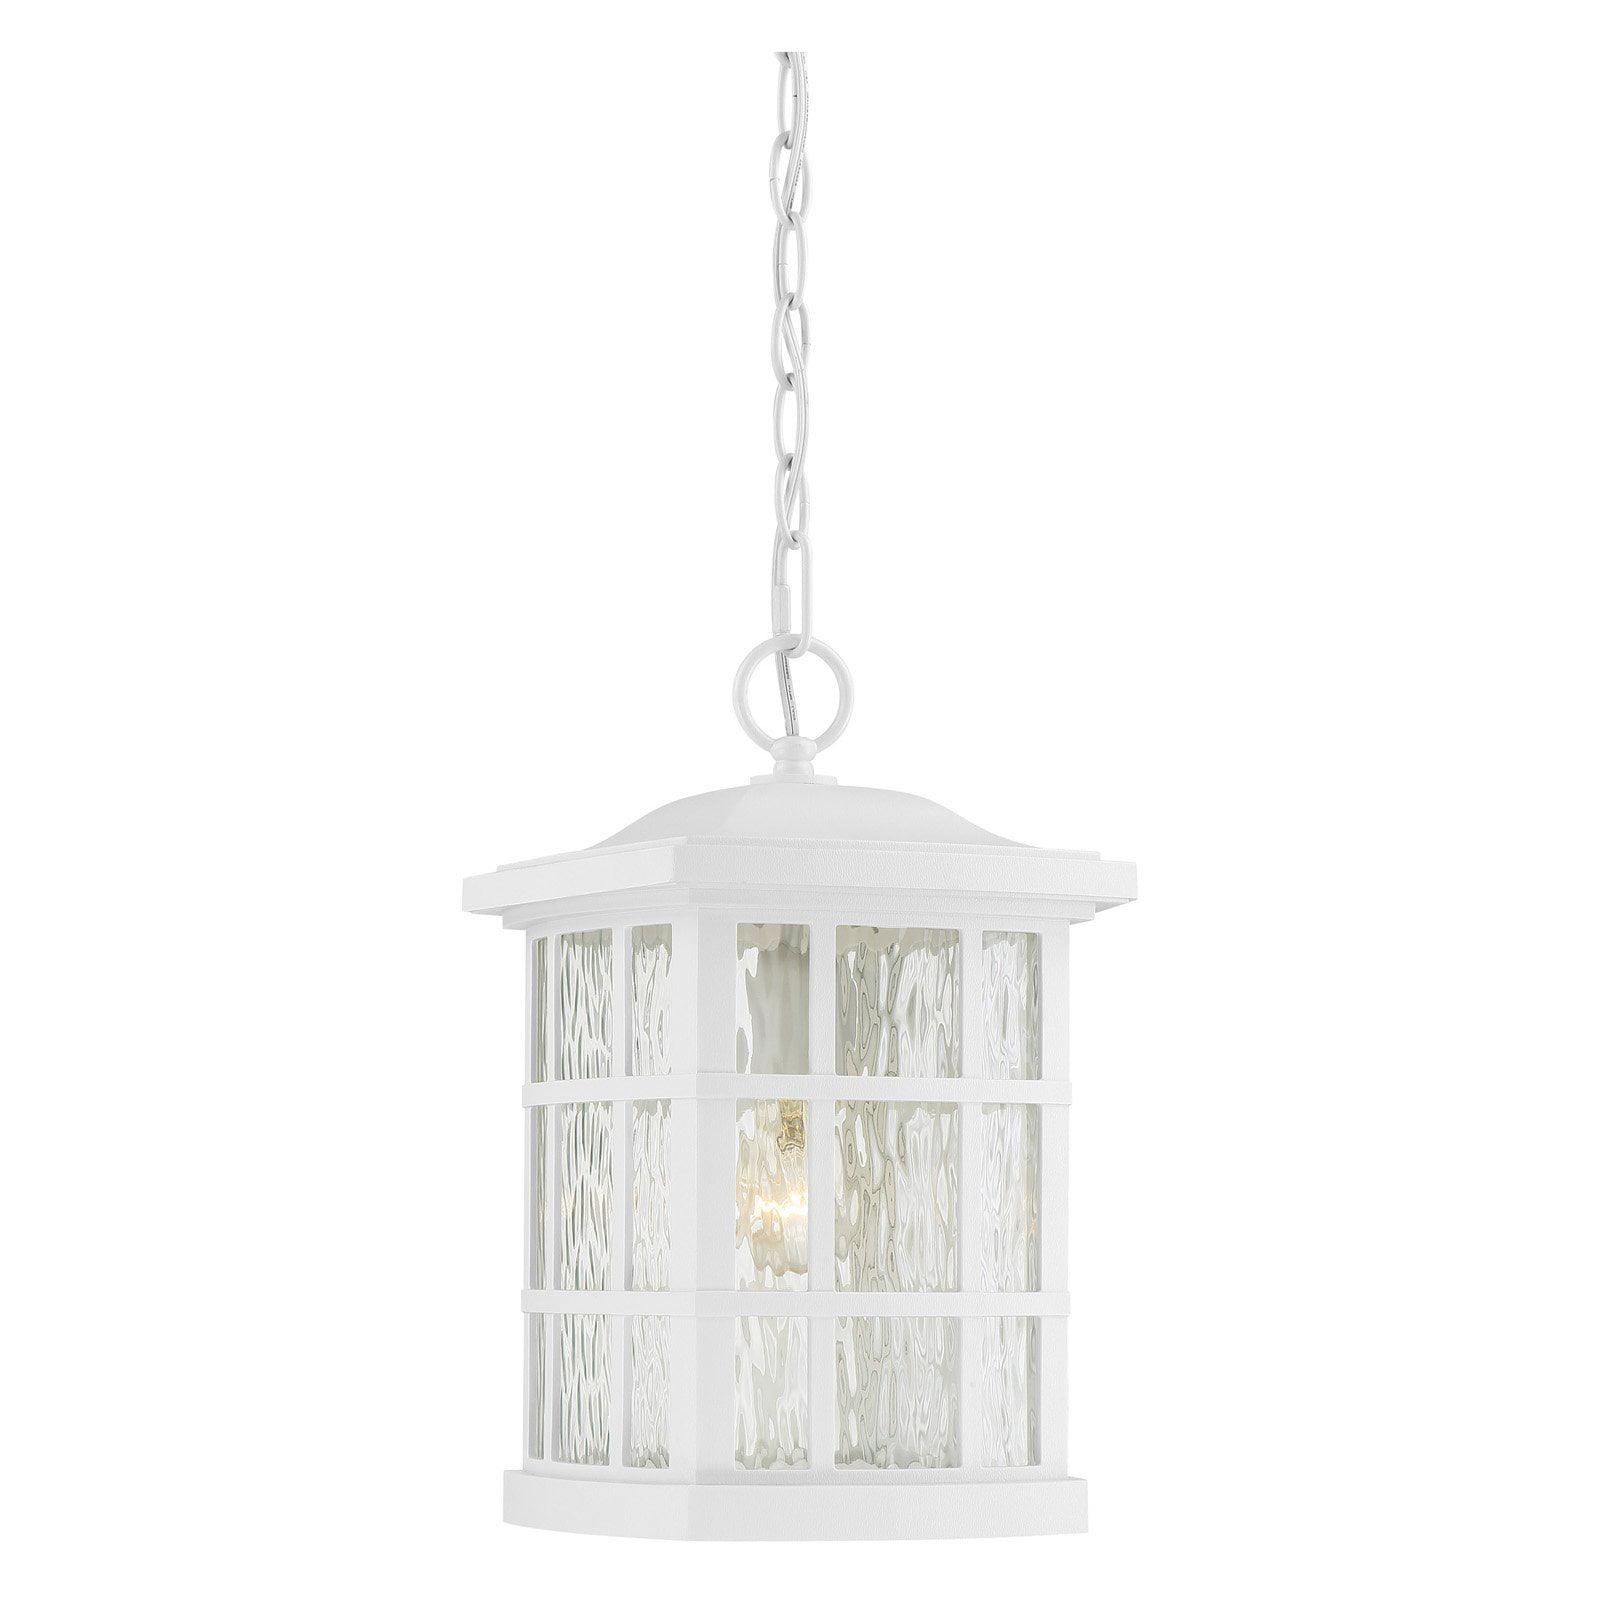 Quoizel Stonington SNN1909 Outdoor Hanging Lantern by Quoizel